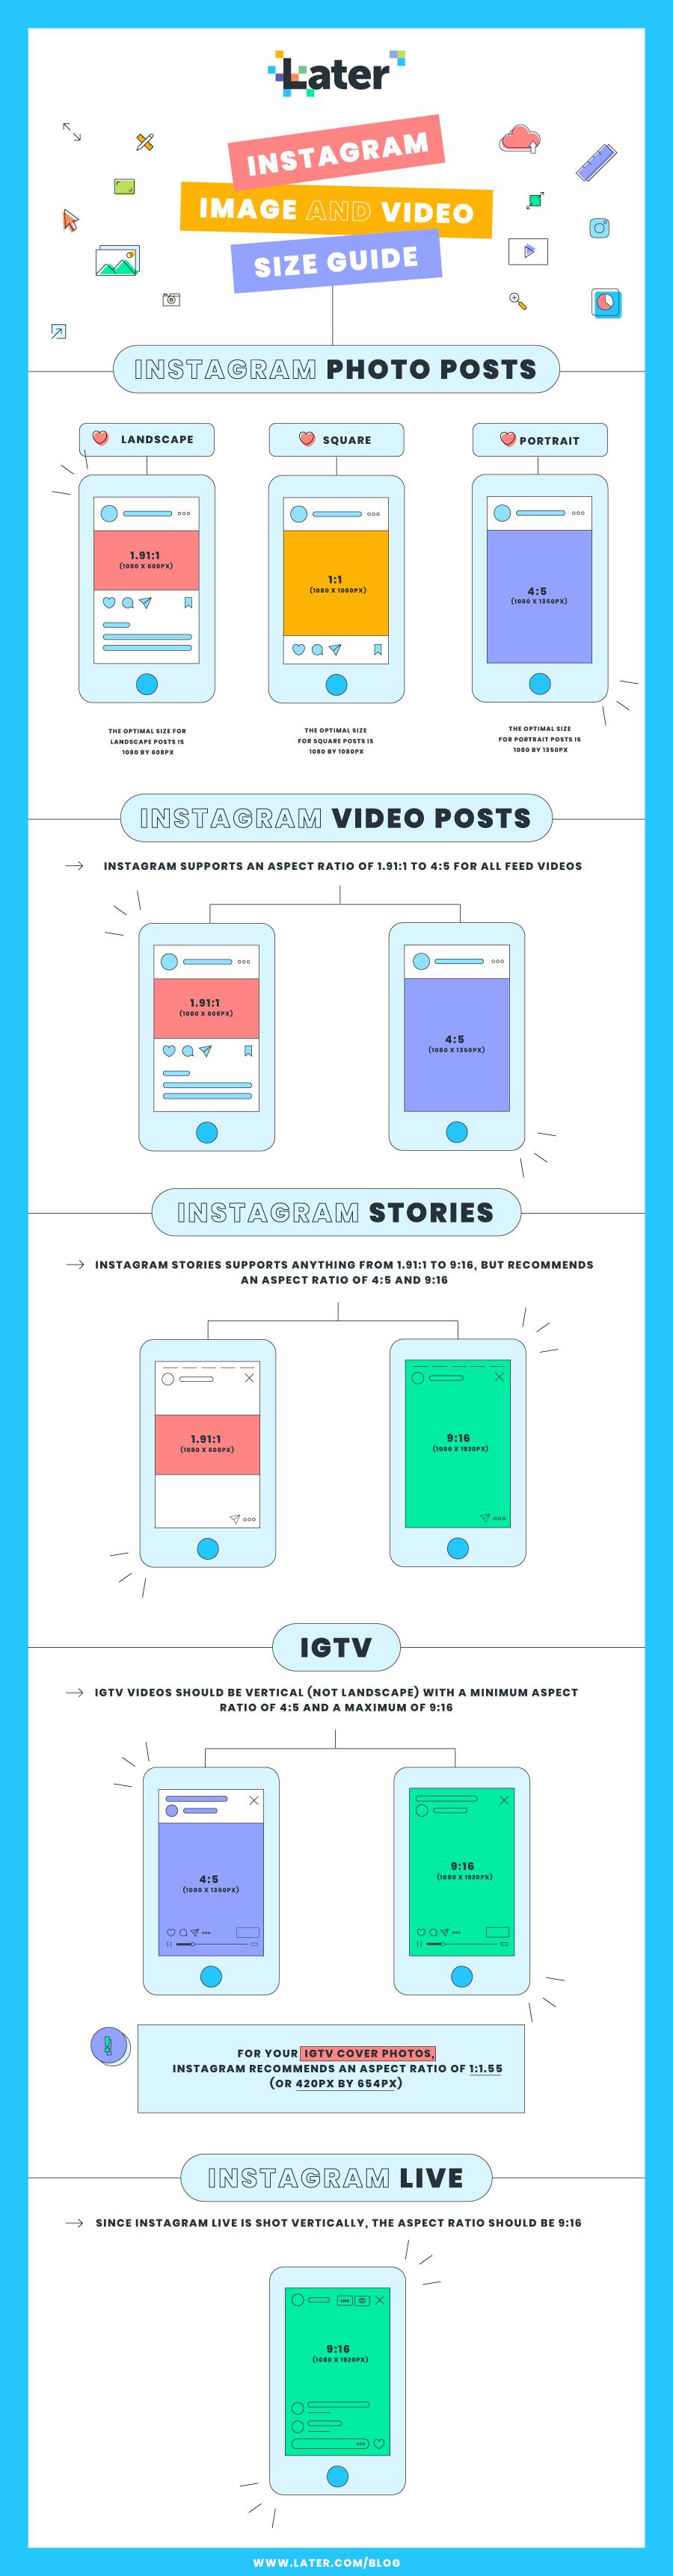 Instagram, Instagram Größe, Instagram-Formate, Instagram Video, Instagram Seitenverhältnis, Instagram Pixel